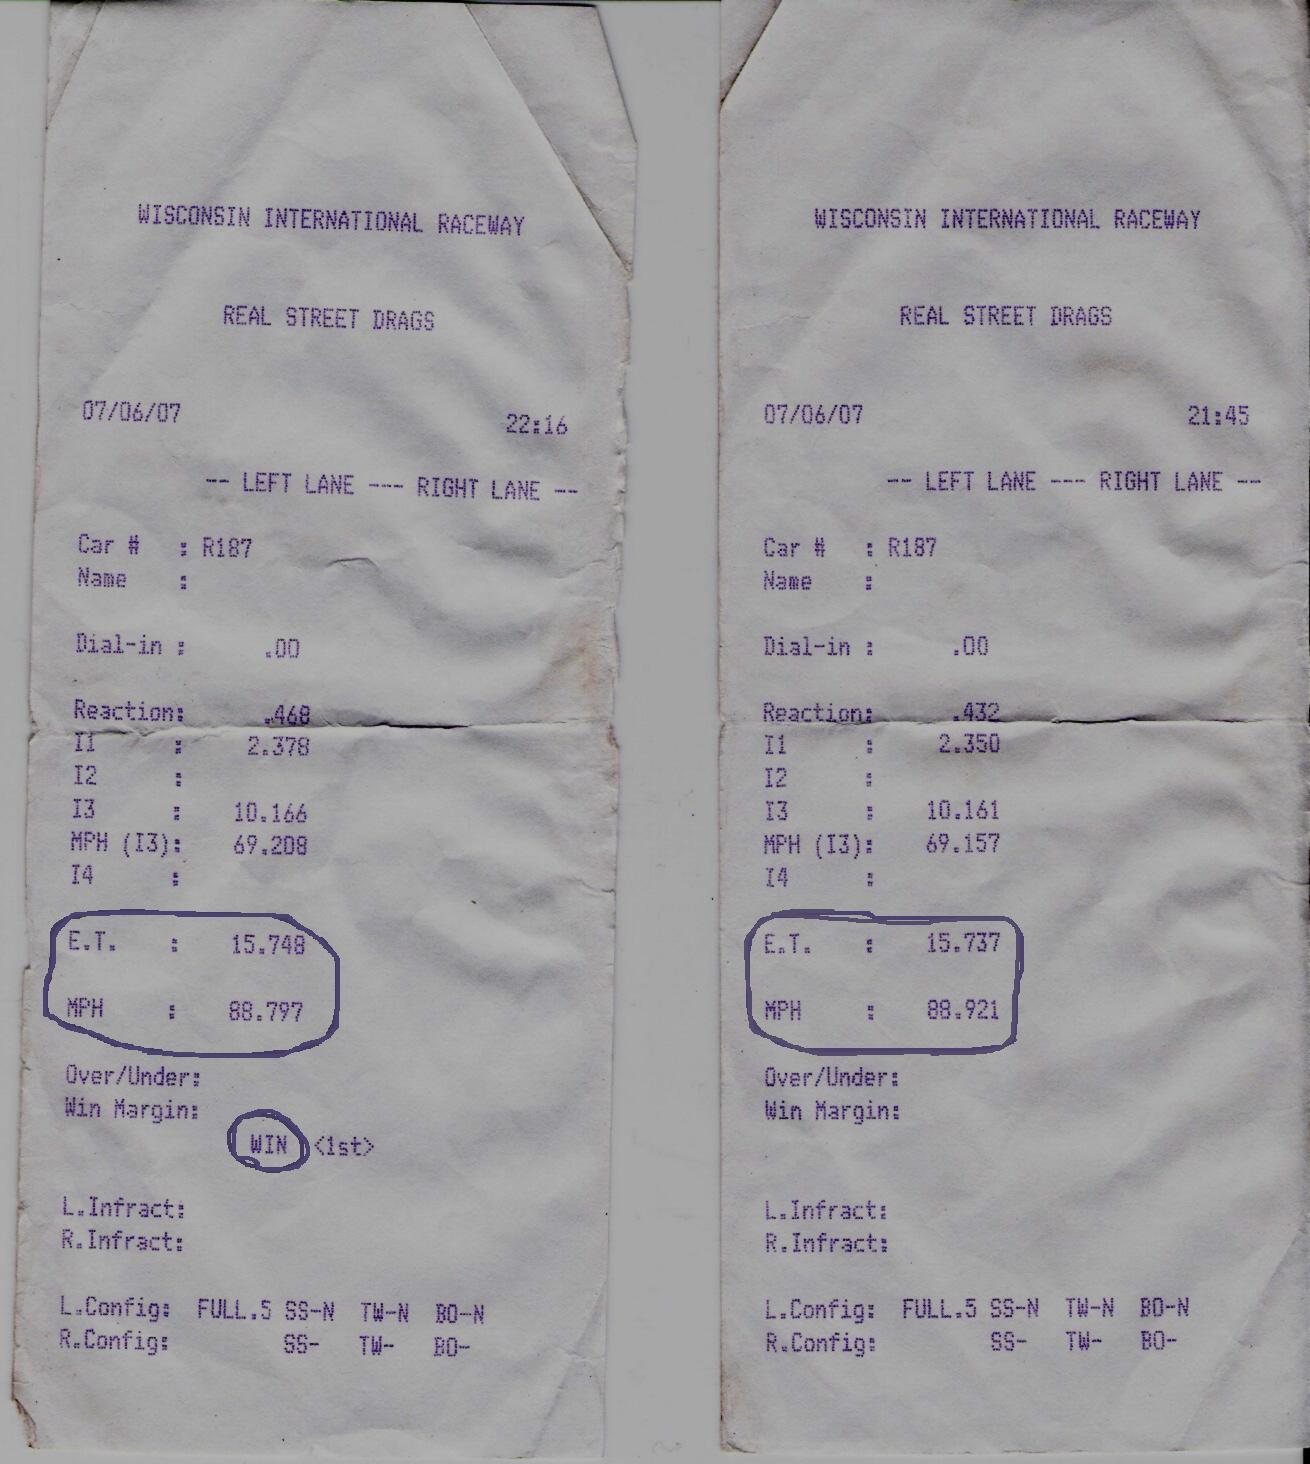 Saab 9-3 Timeslip Scan